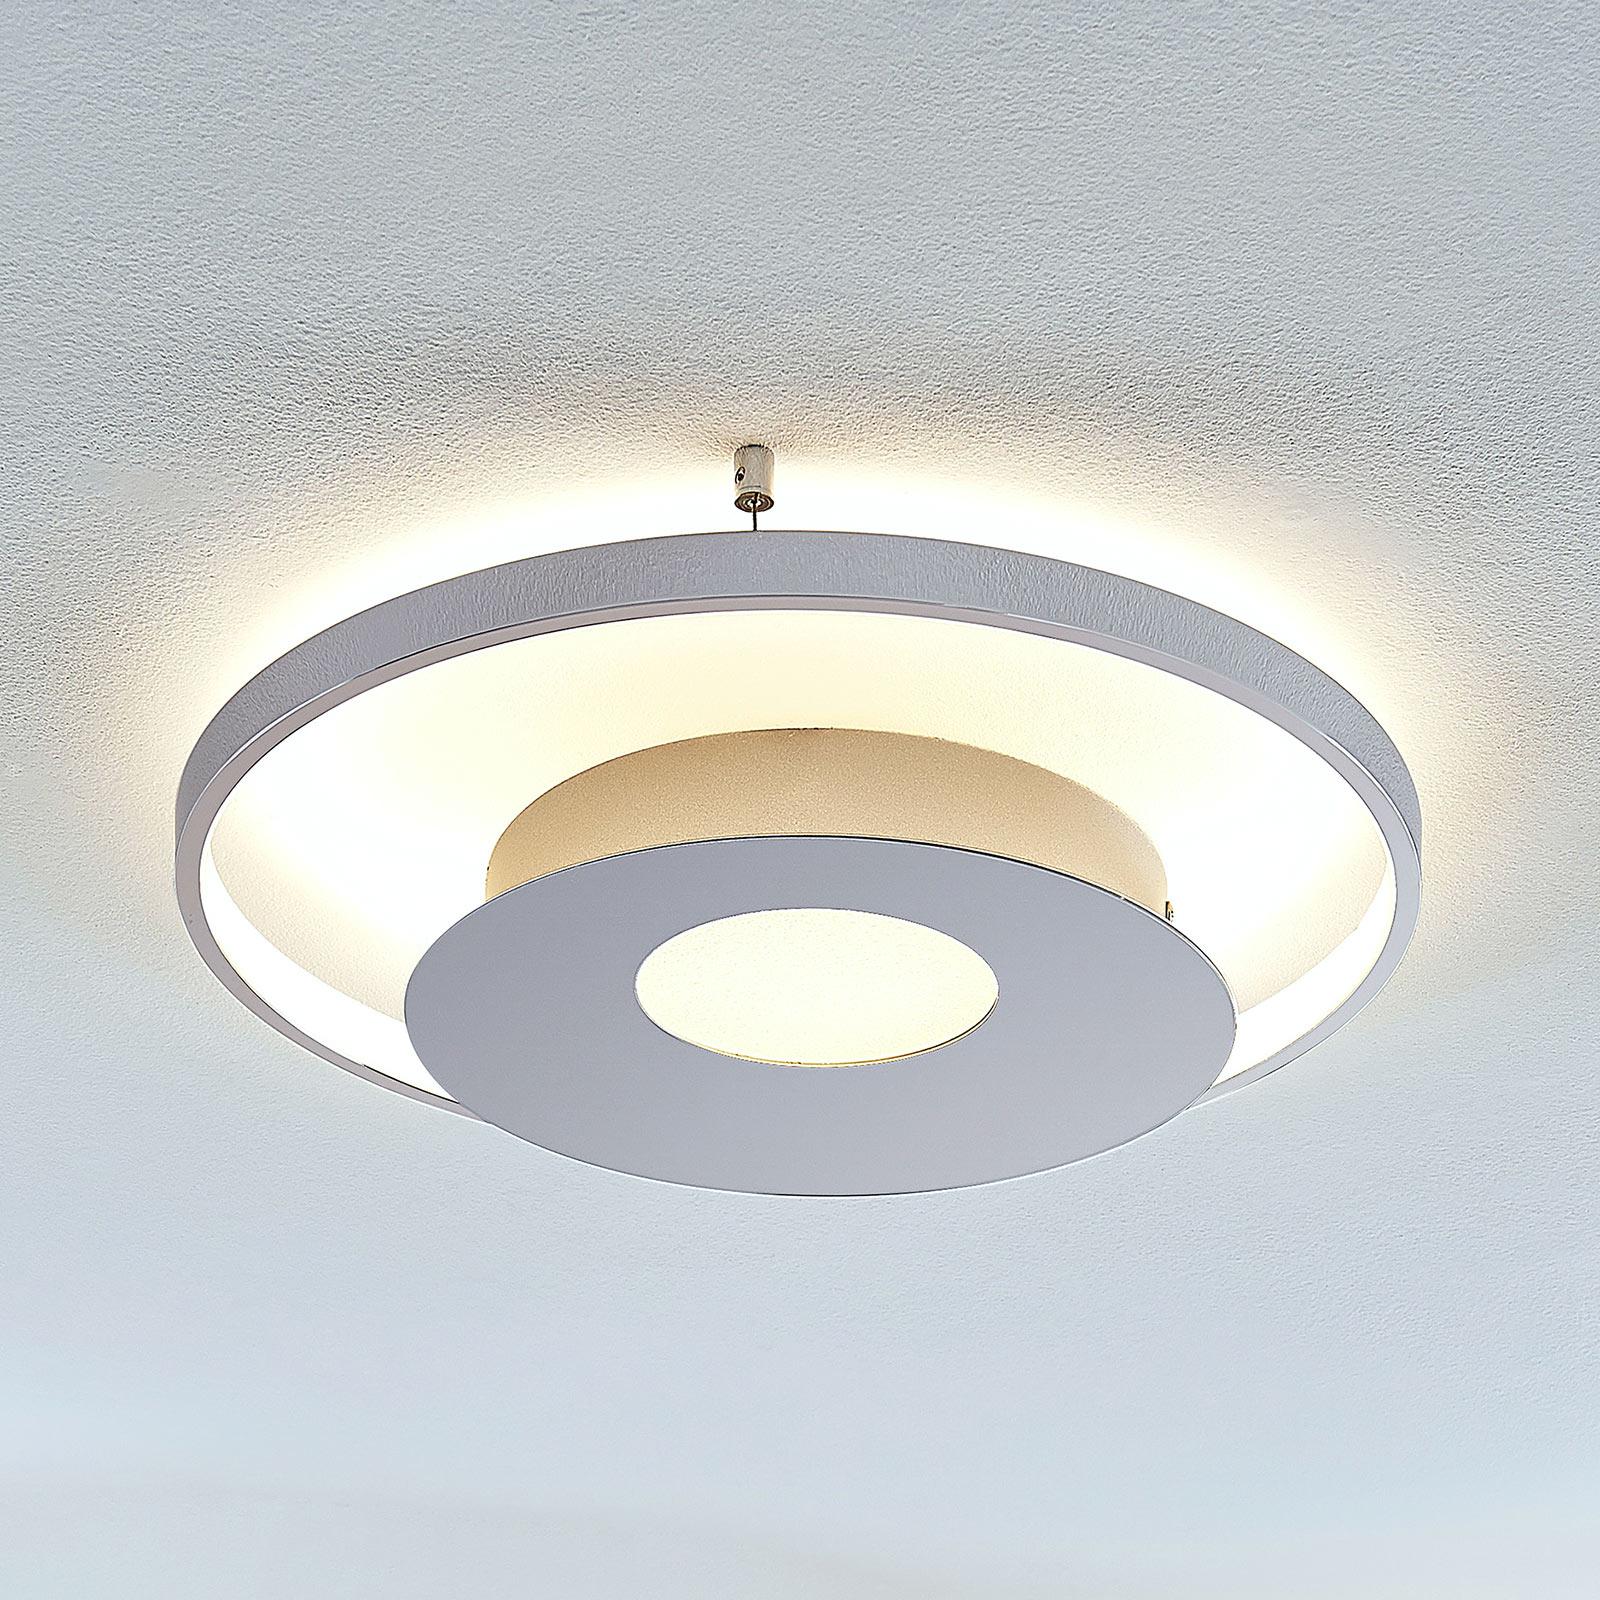 LED-kattovalaisin Anays, pyöreä, 42 cm